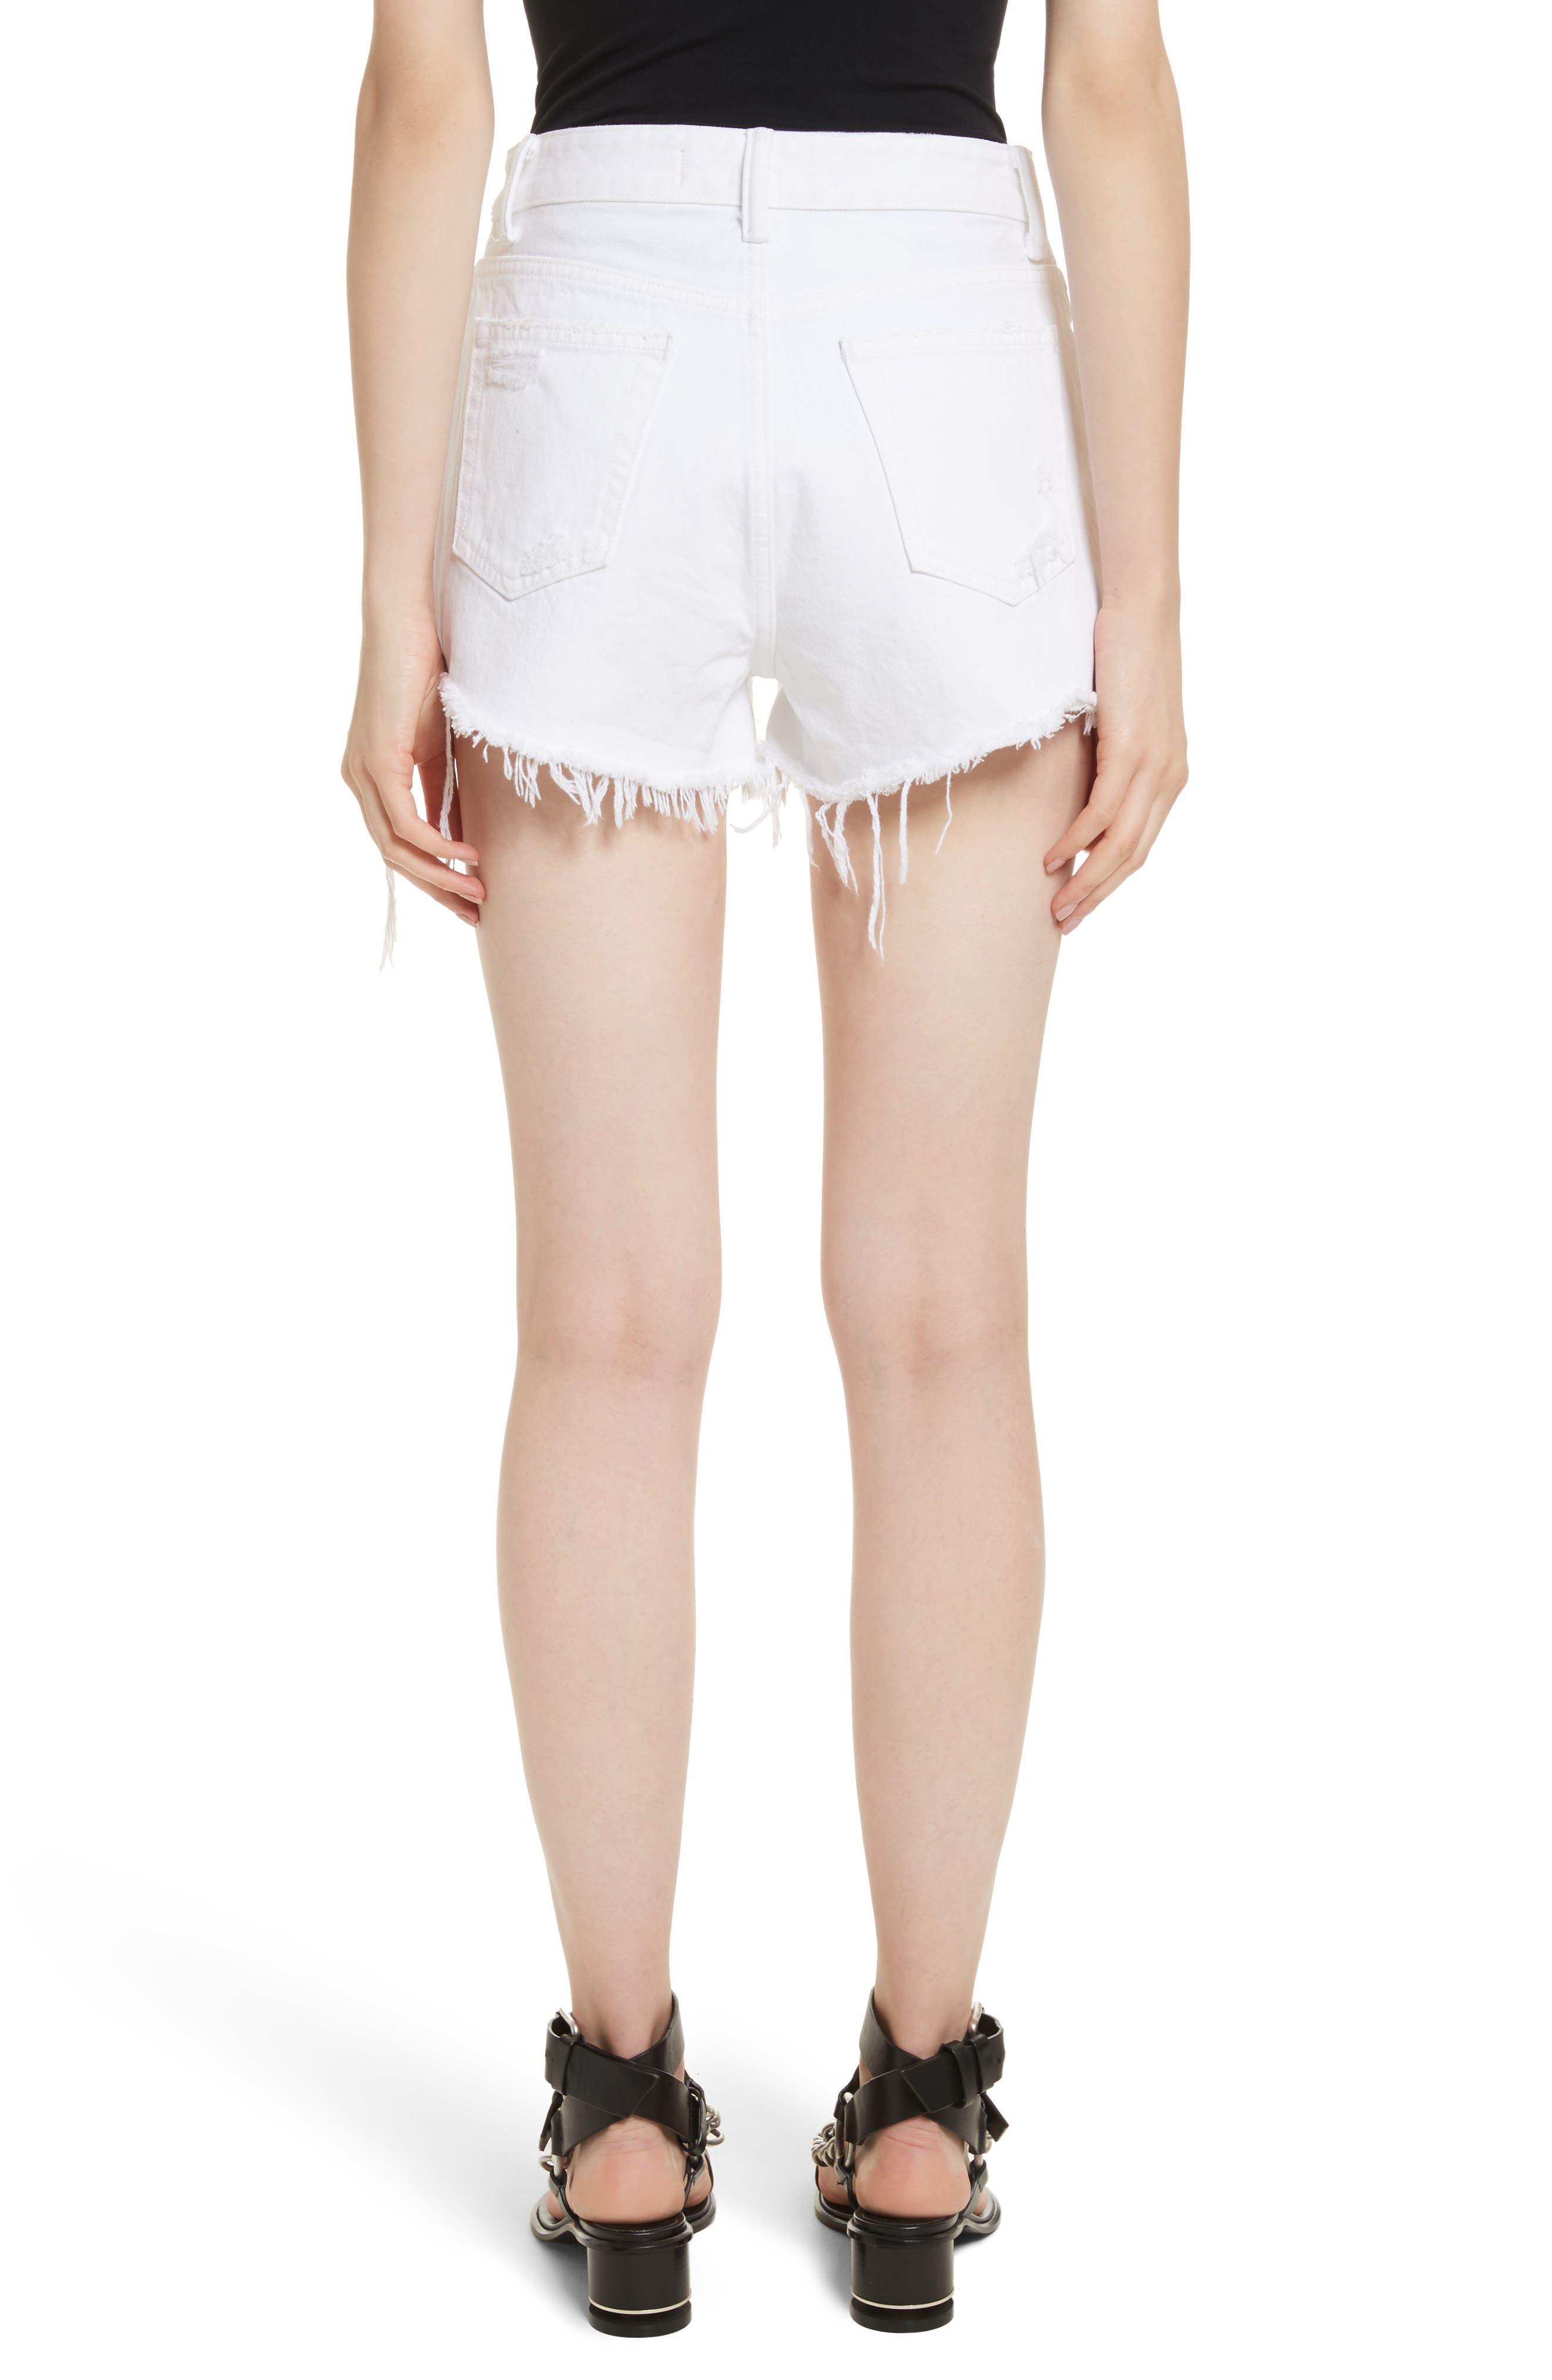 Bite White Ripped Denim Shorts,                             Alternate thumbnail 2, color,